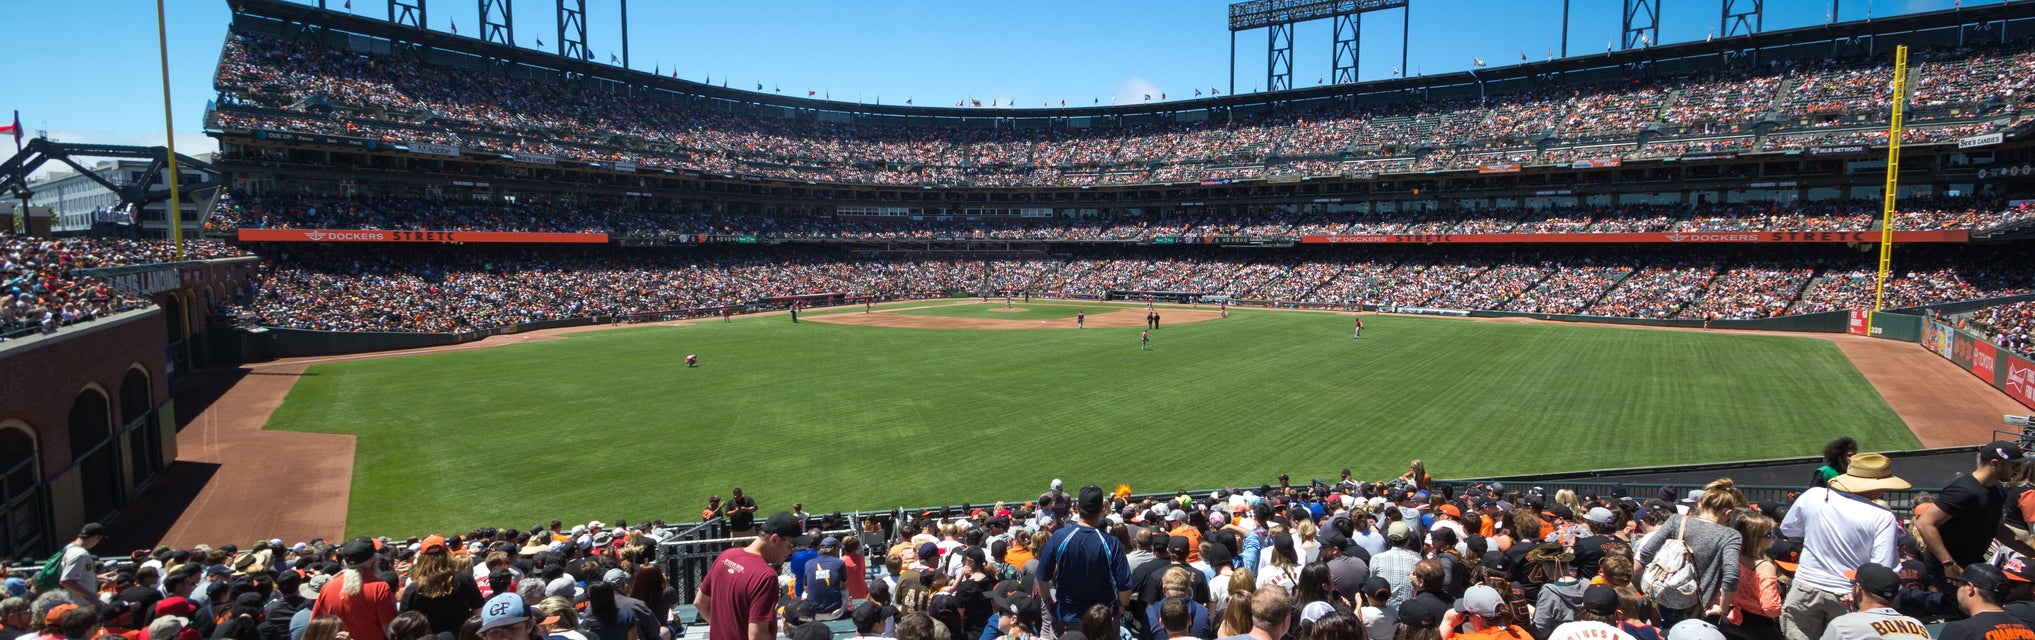 Seat view from Center Field Bleachers